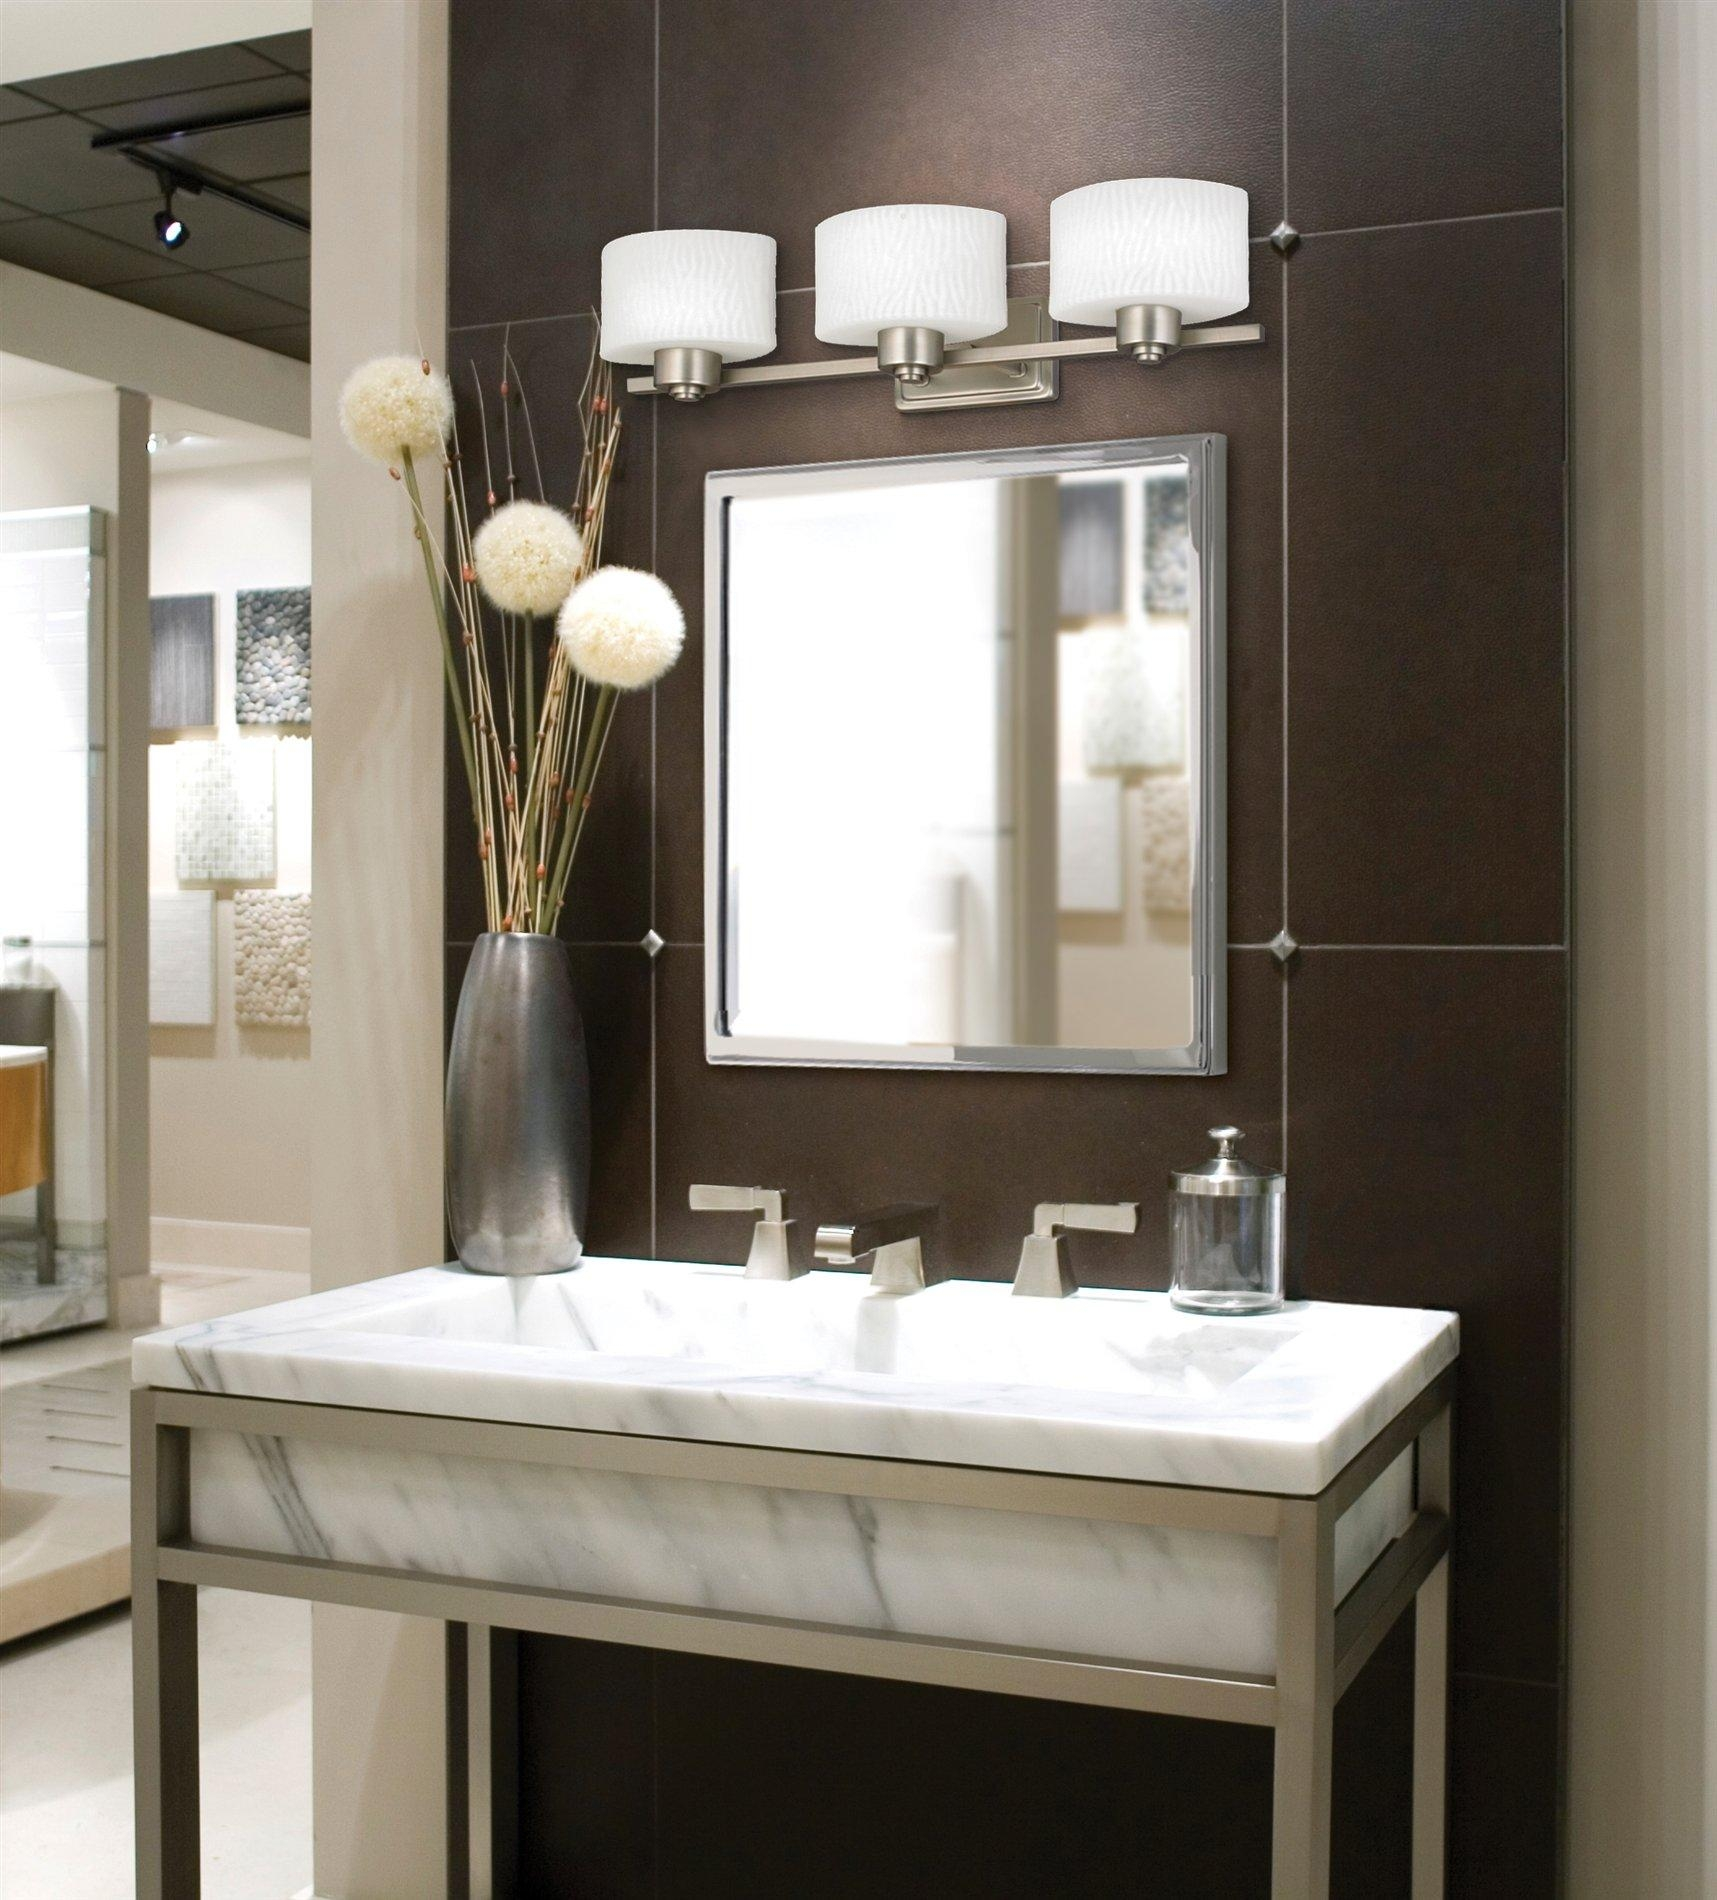 Bathroom Design : Fabulous Long Vanity Mirror Corner Bathroom Pertaining To Small Bathroom Vanity Mirrors (Image 8 of 20)